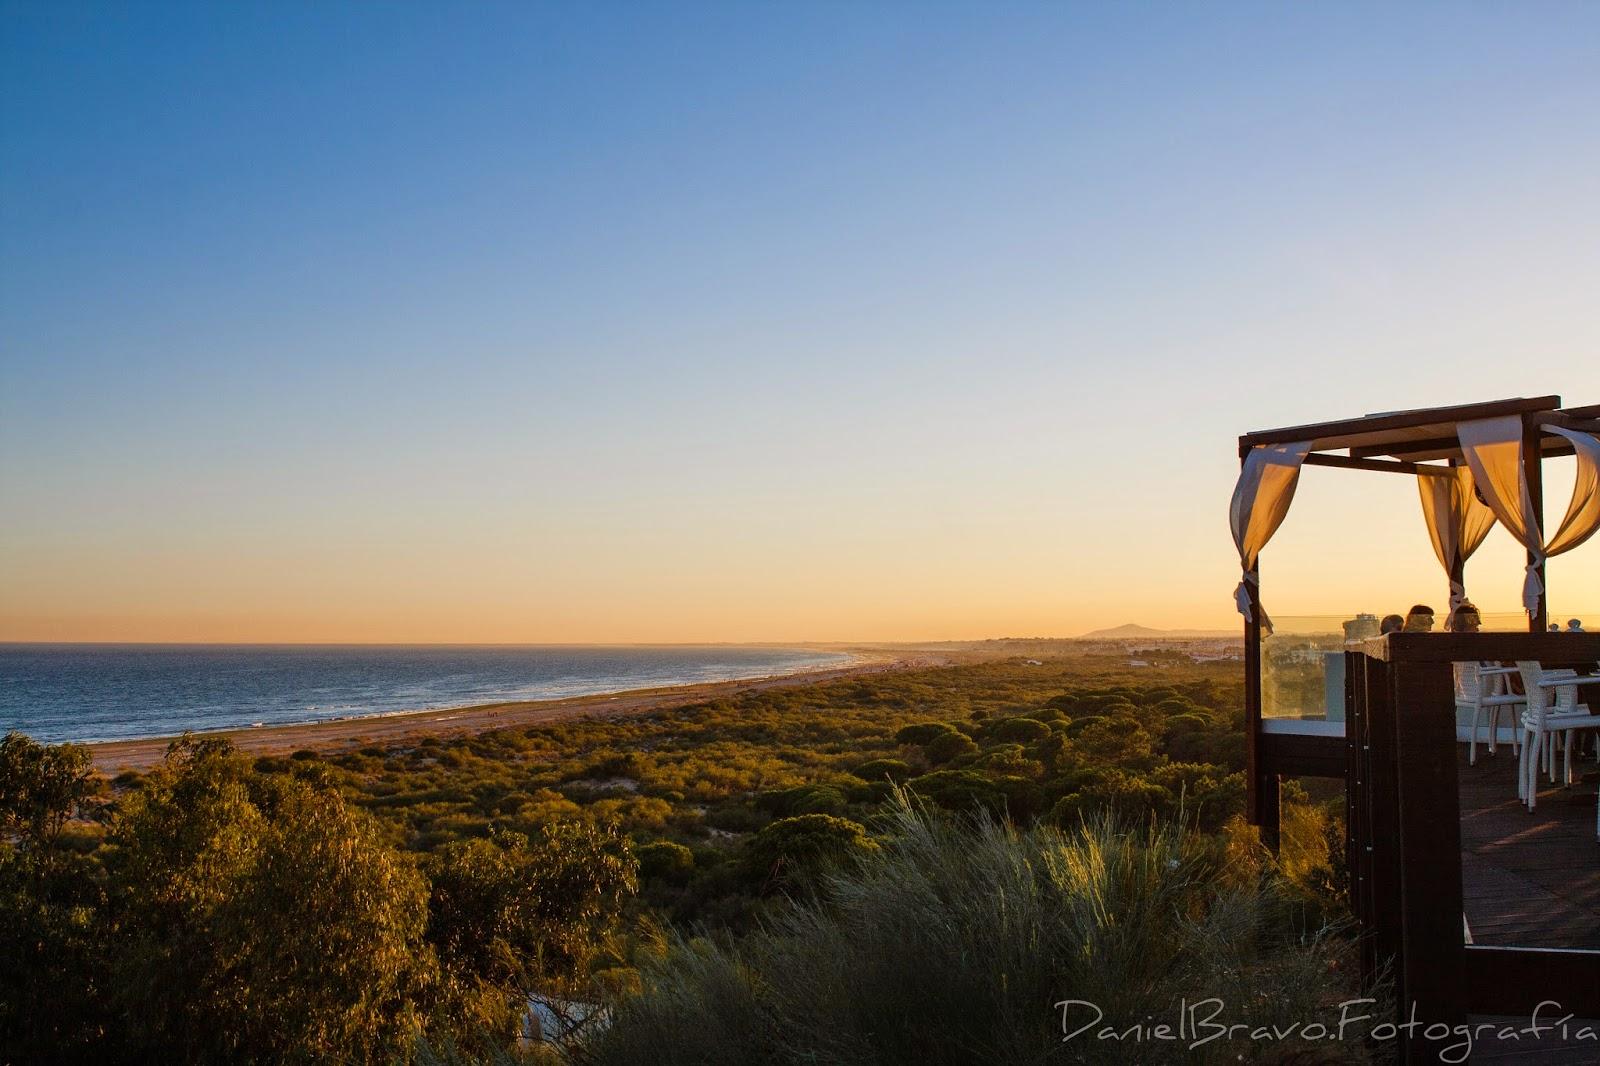 Algarve, Portugal, Caçela Velha, mar, agua, playa, sol, vacaciones, Tavira, Praia Verde